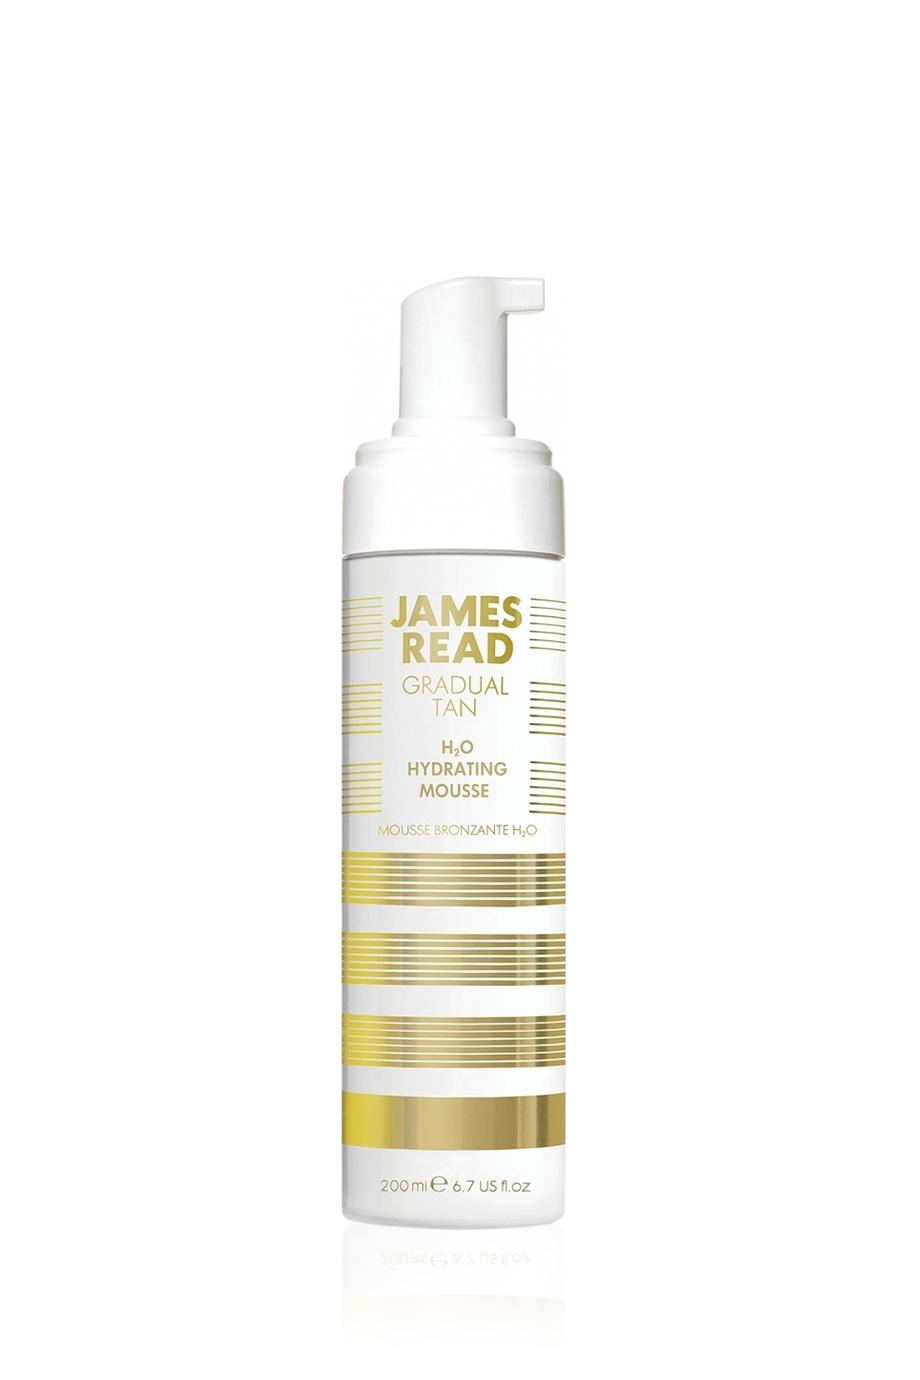 Аква мусс для загара James Read Gradual Tan Hydrating Mousse 200 мл